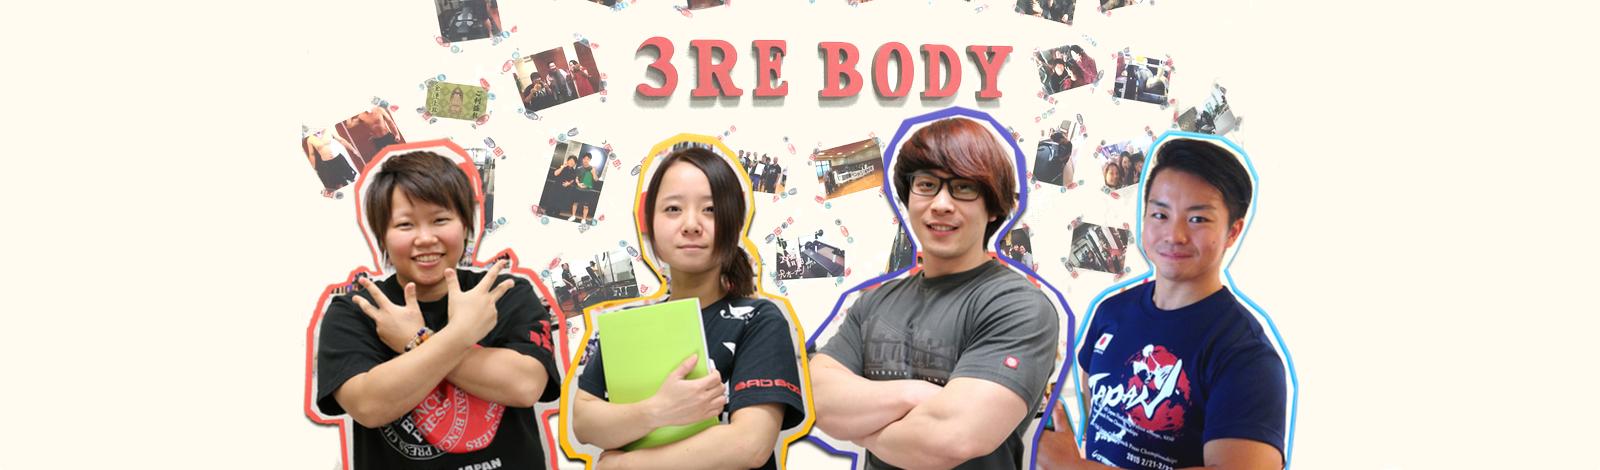 3re-body_bg1